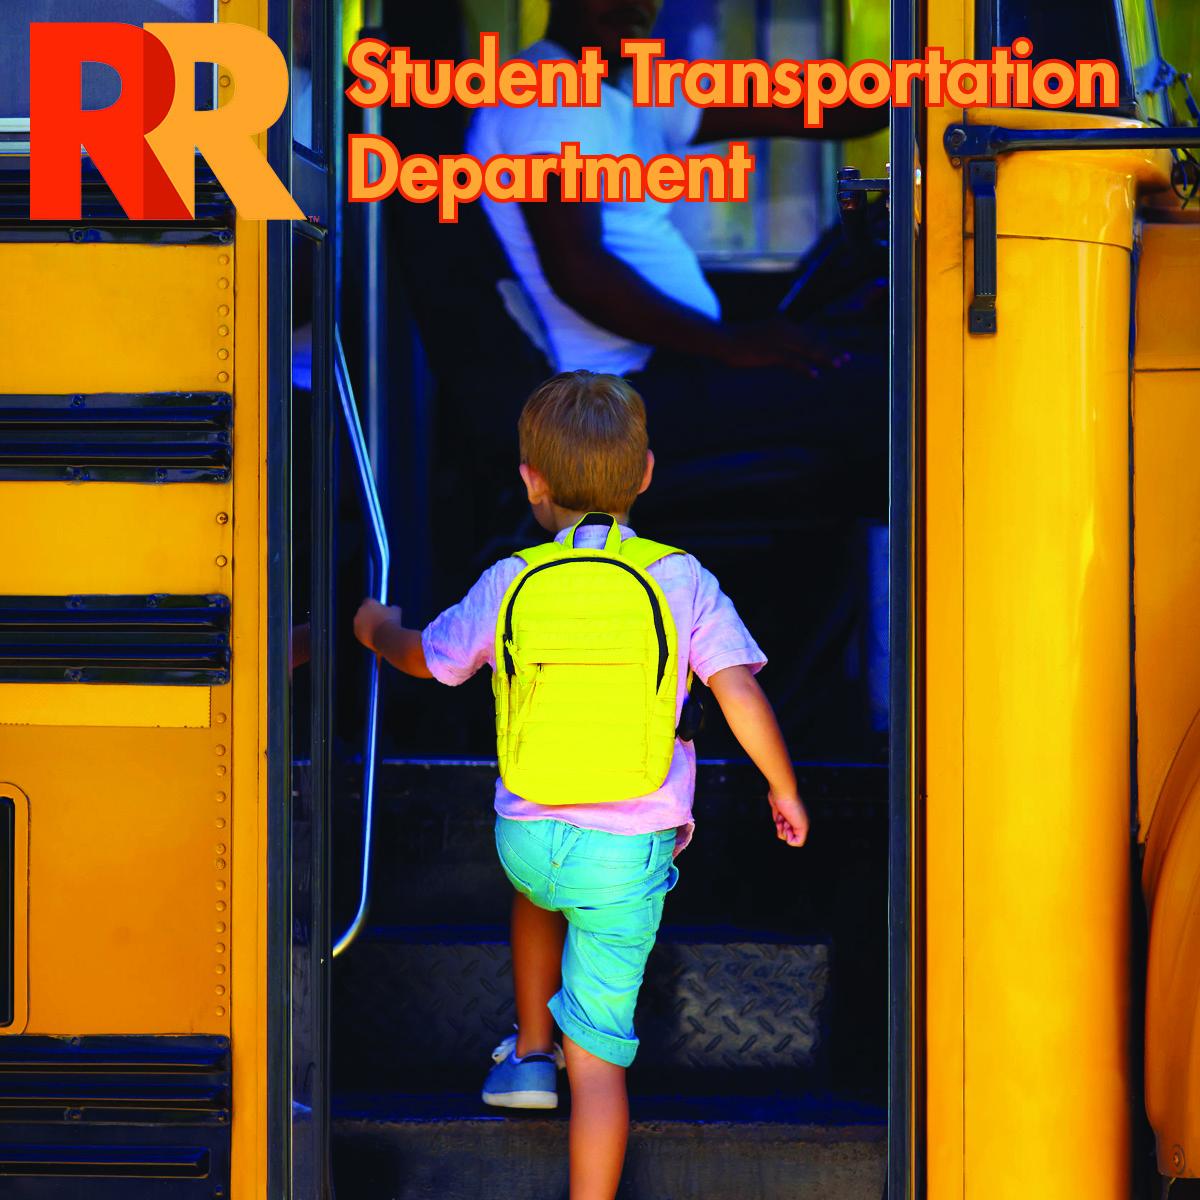 Student Transportation Department